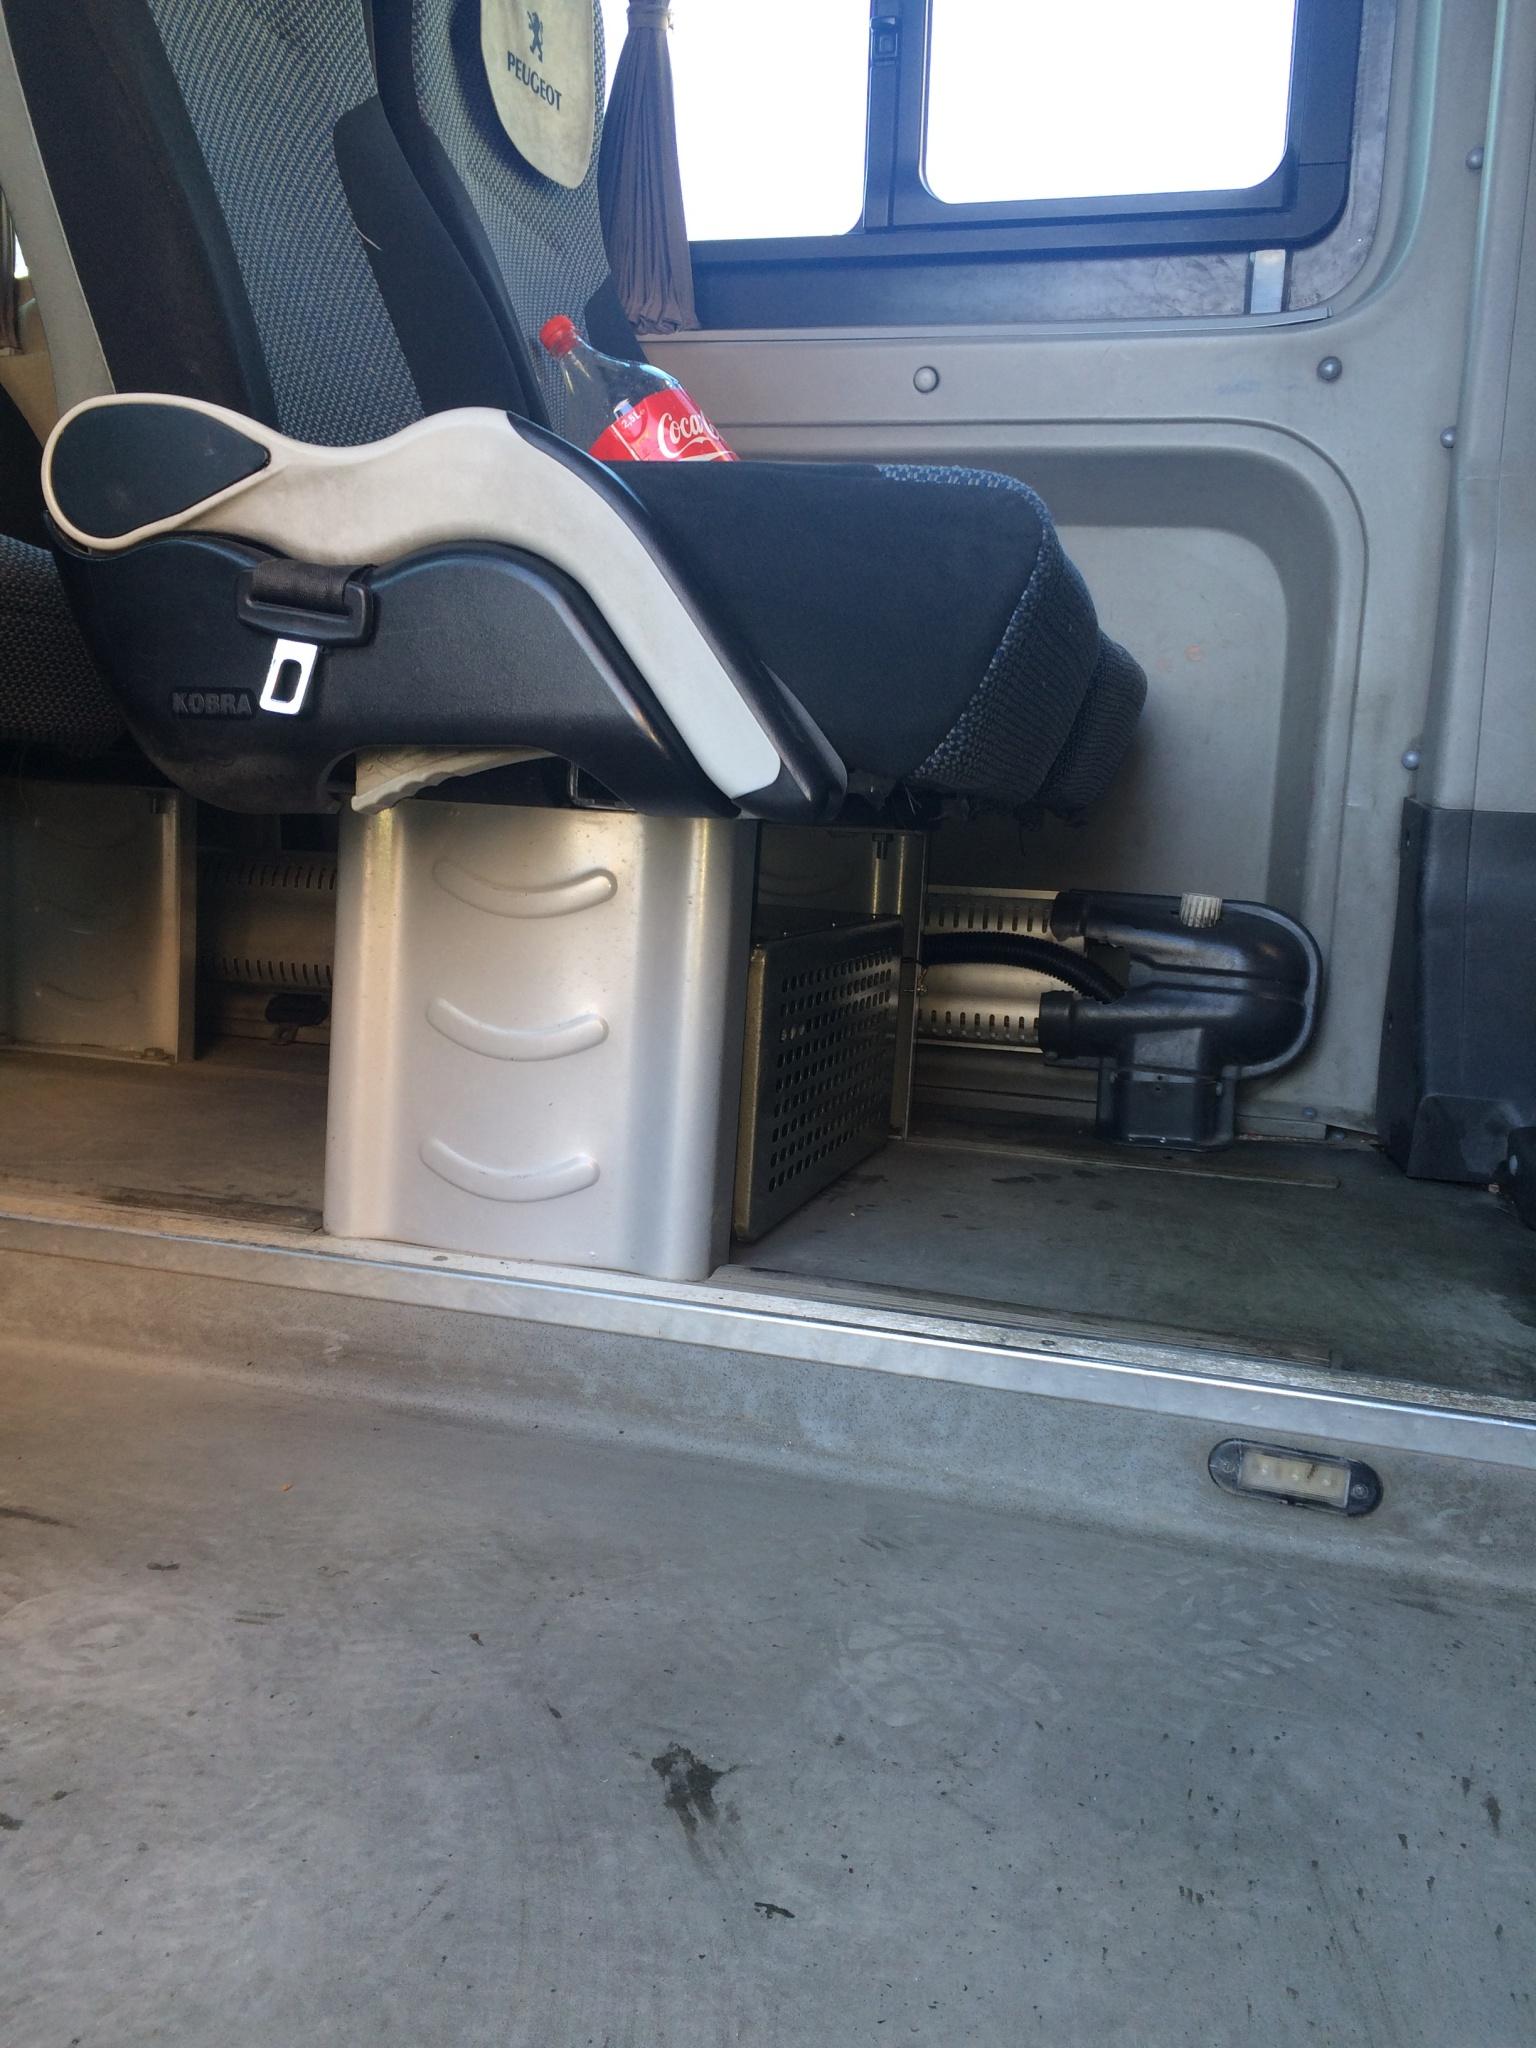 Çorum kaloriferi koltuk altı minibüs otobüs+++ montaj Ankara Usta Mühendislik + 05323118894